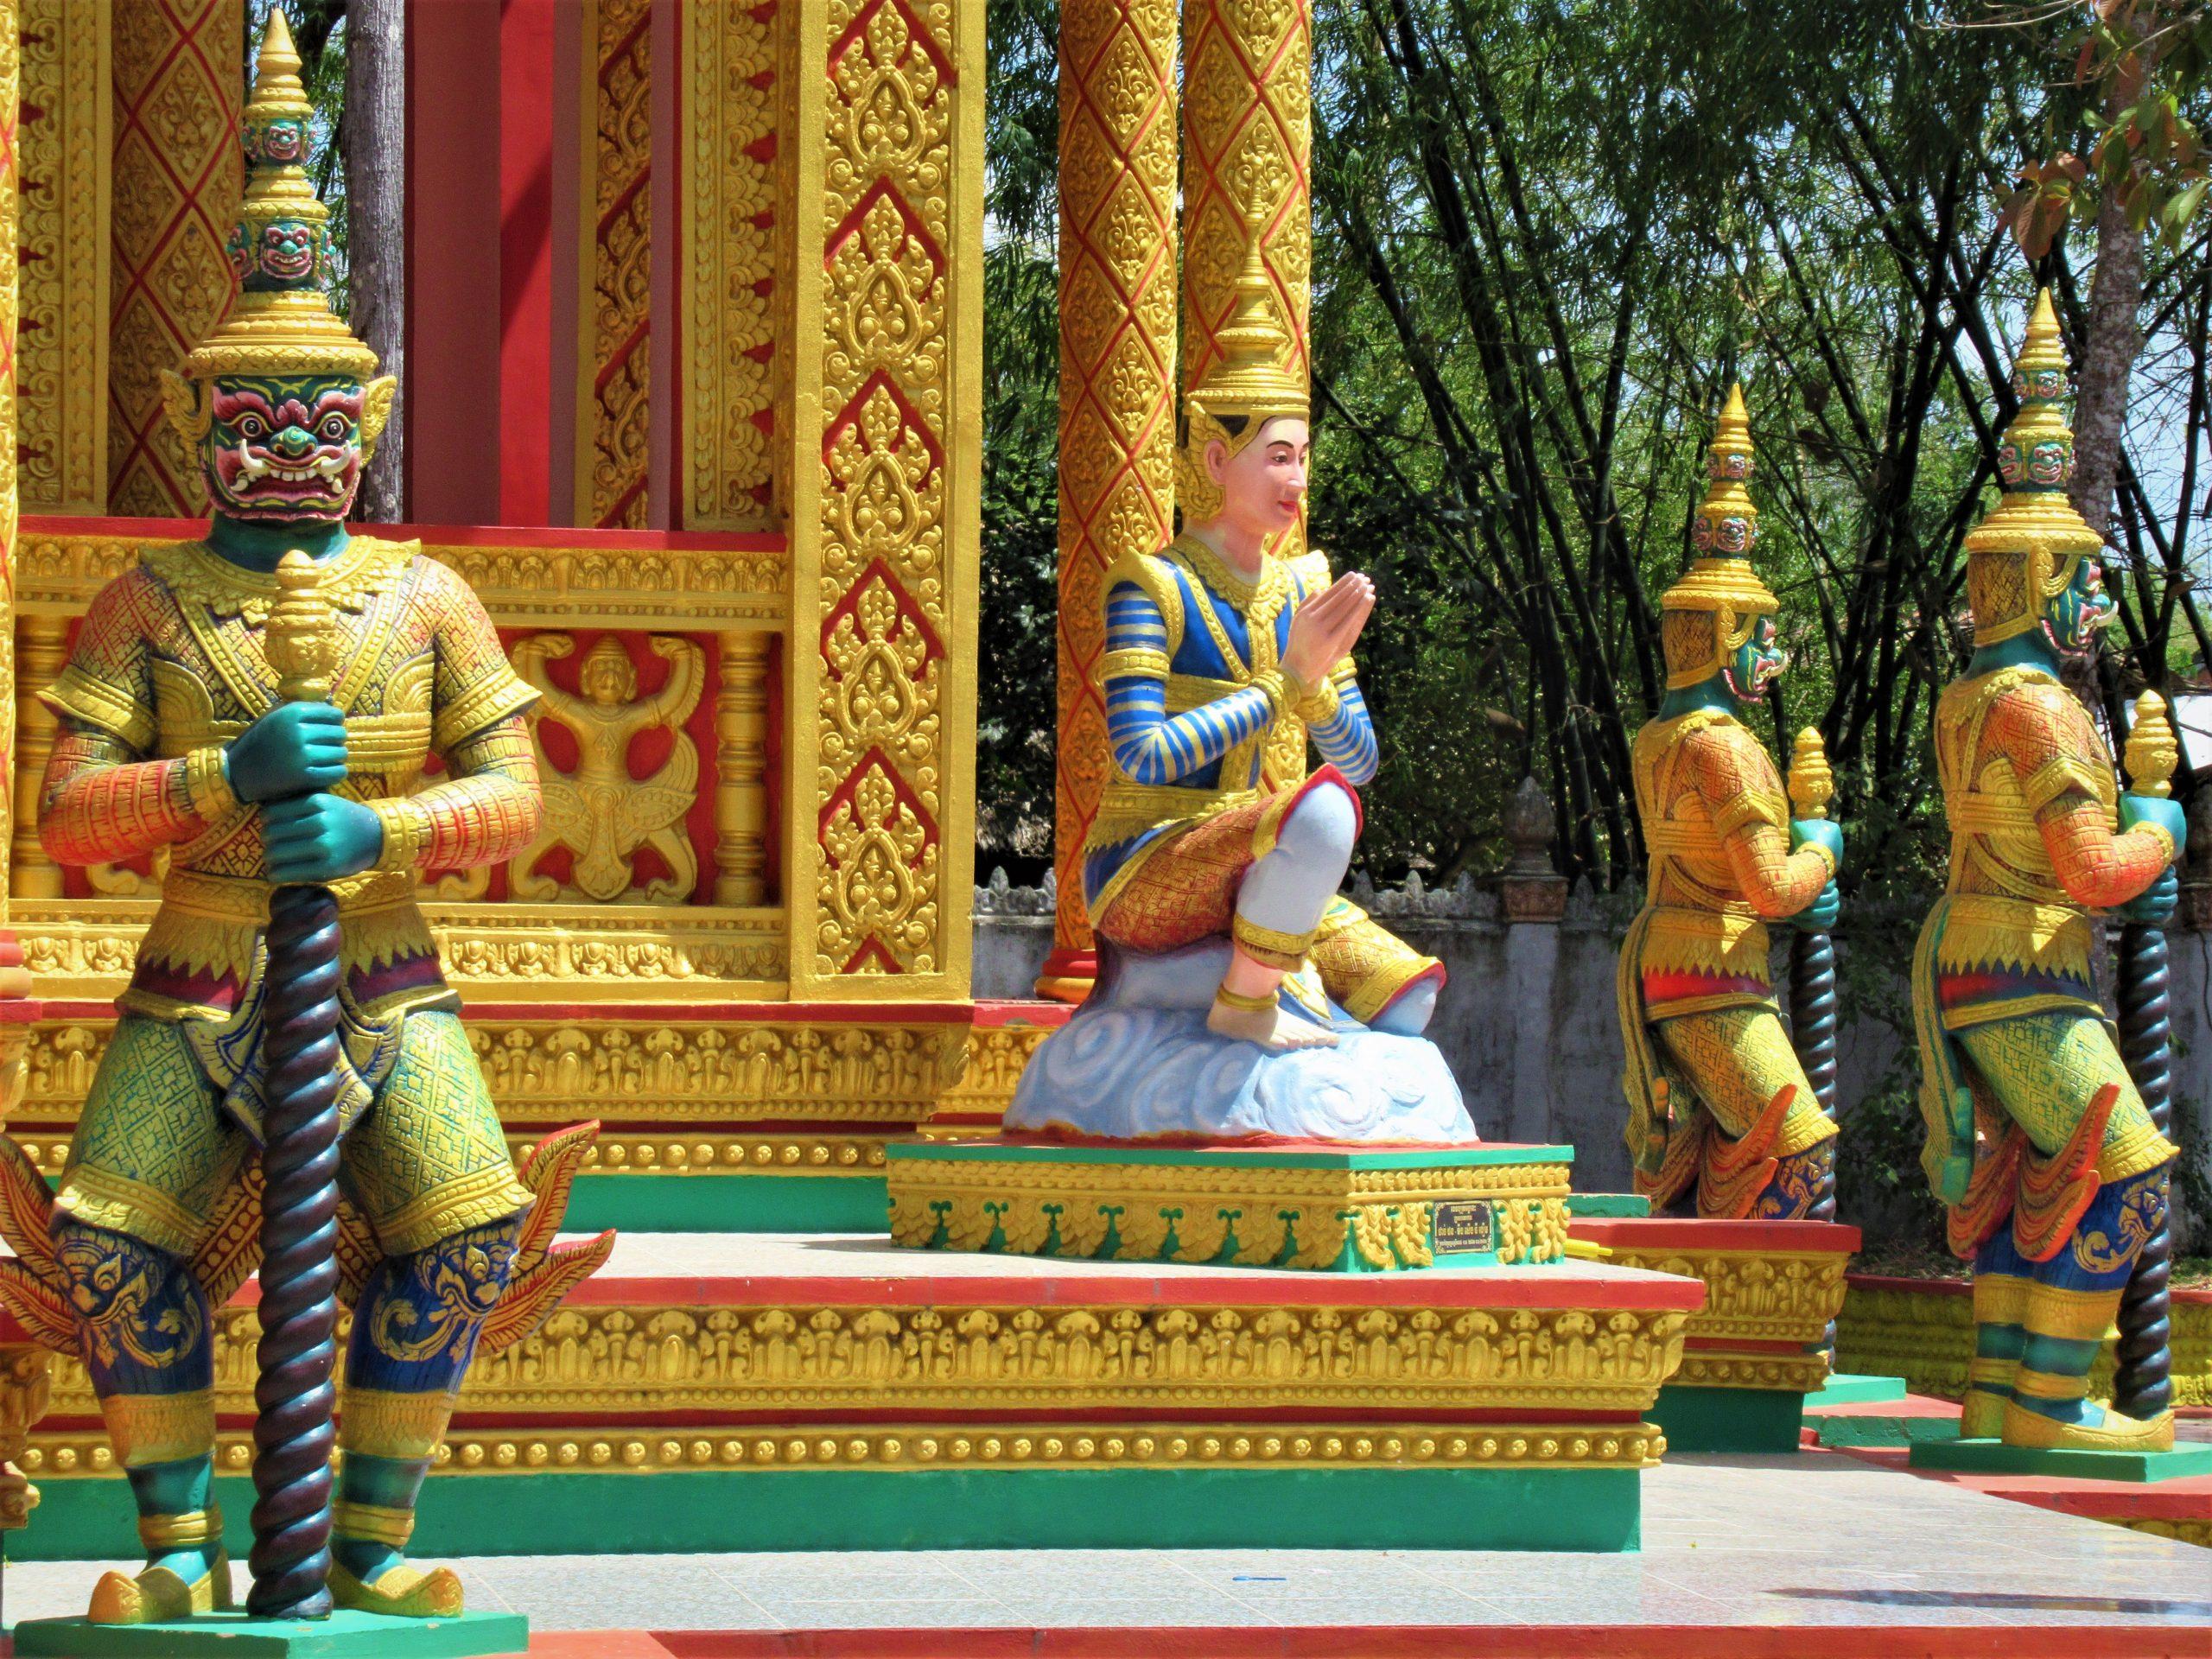 Khmer Temple-Hopping Motorbike Loop, Tra Vinh Province, Mekong Delta, Vietnam